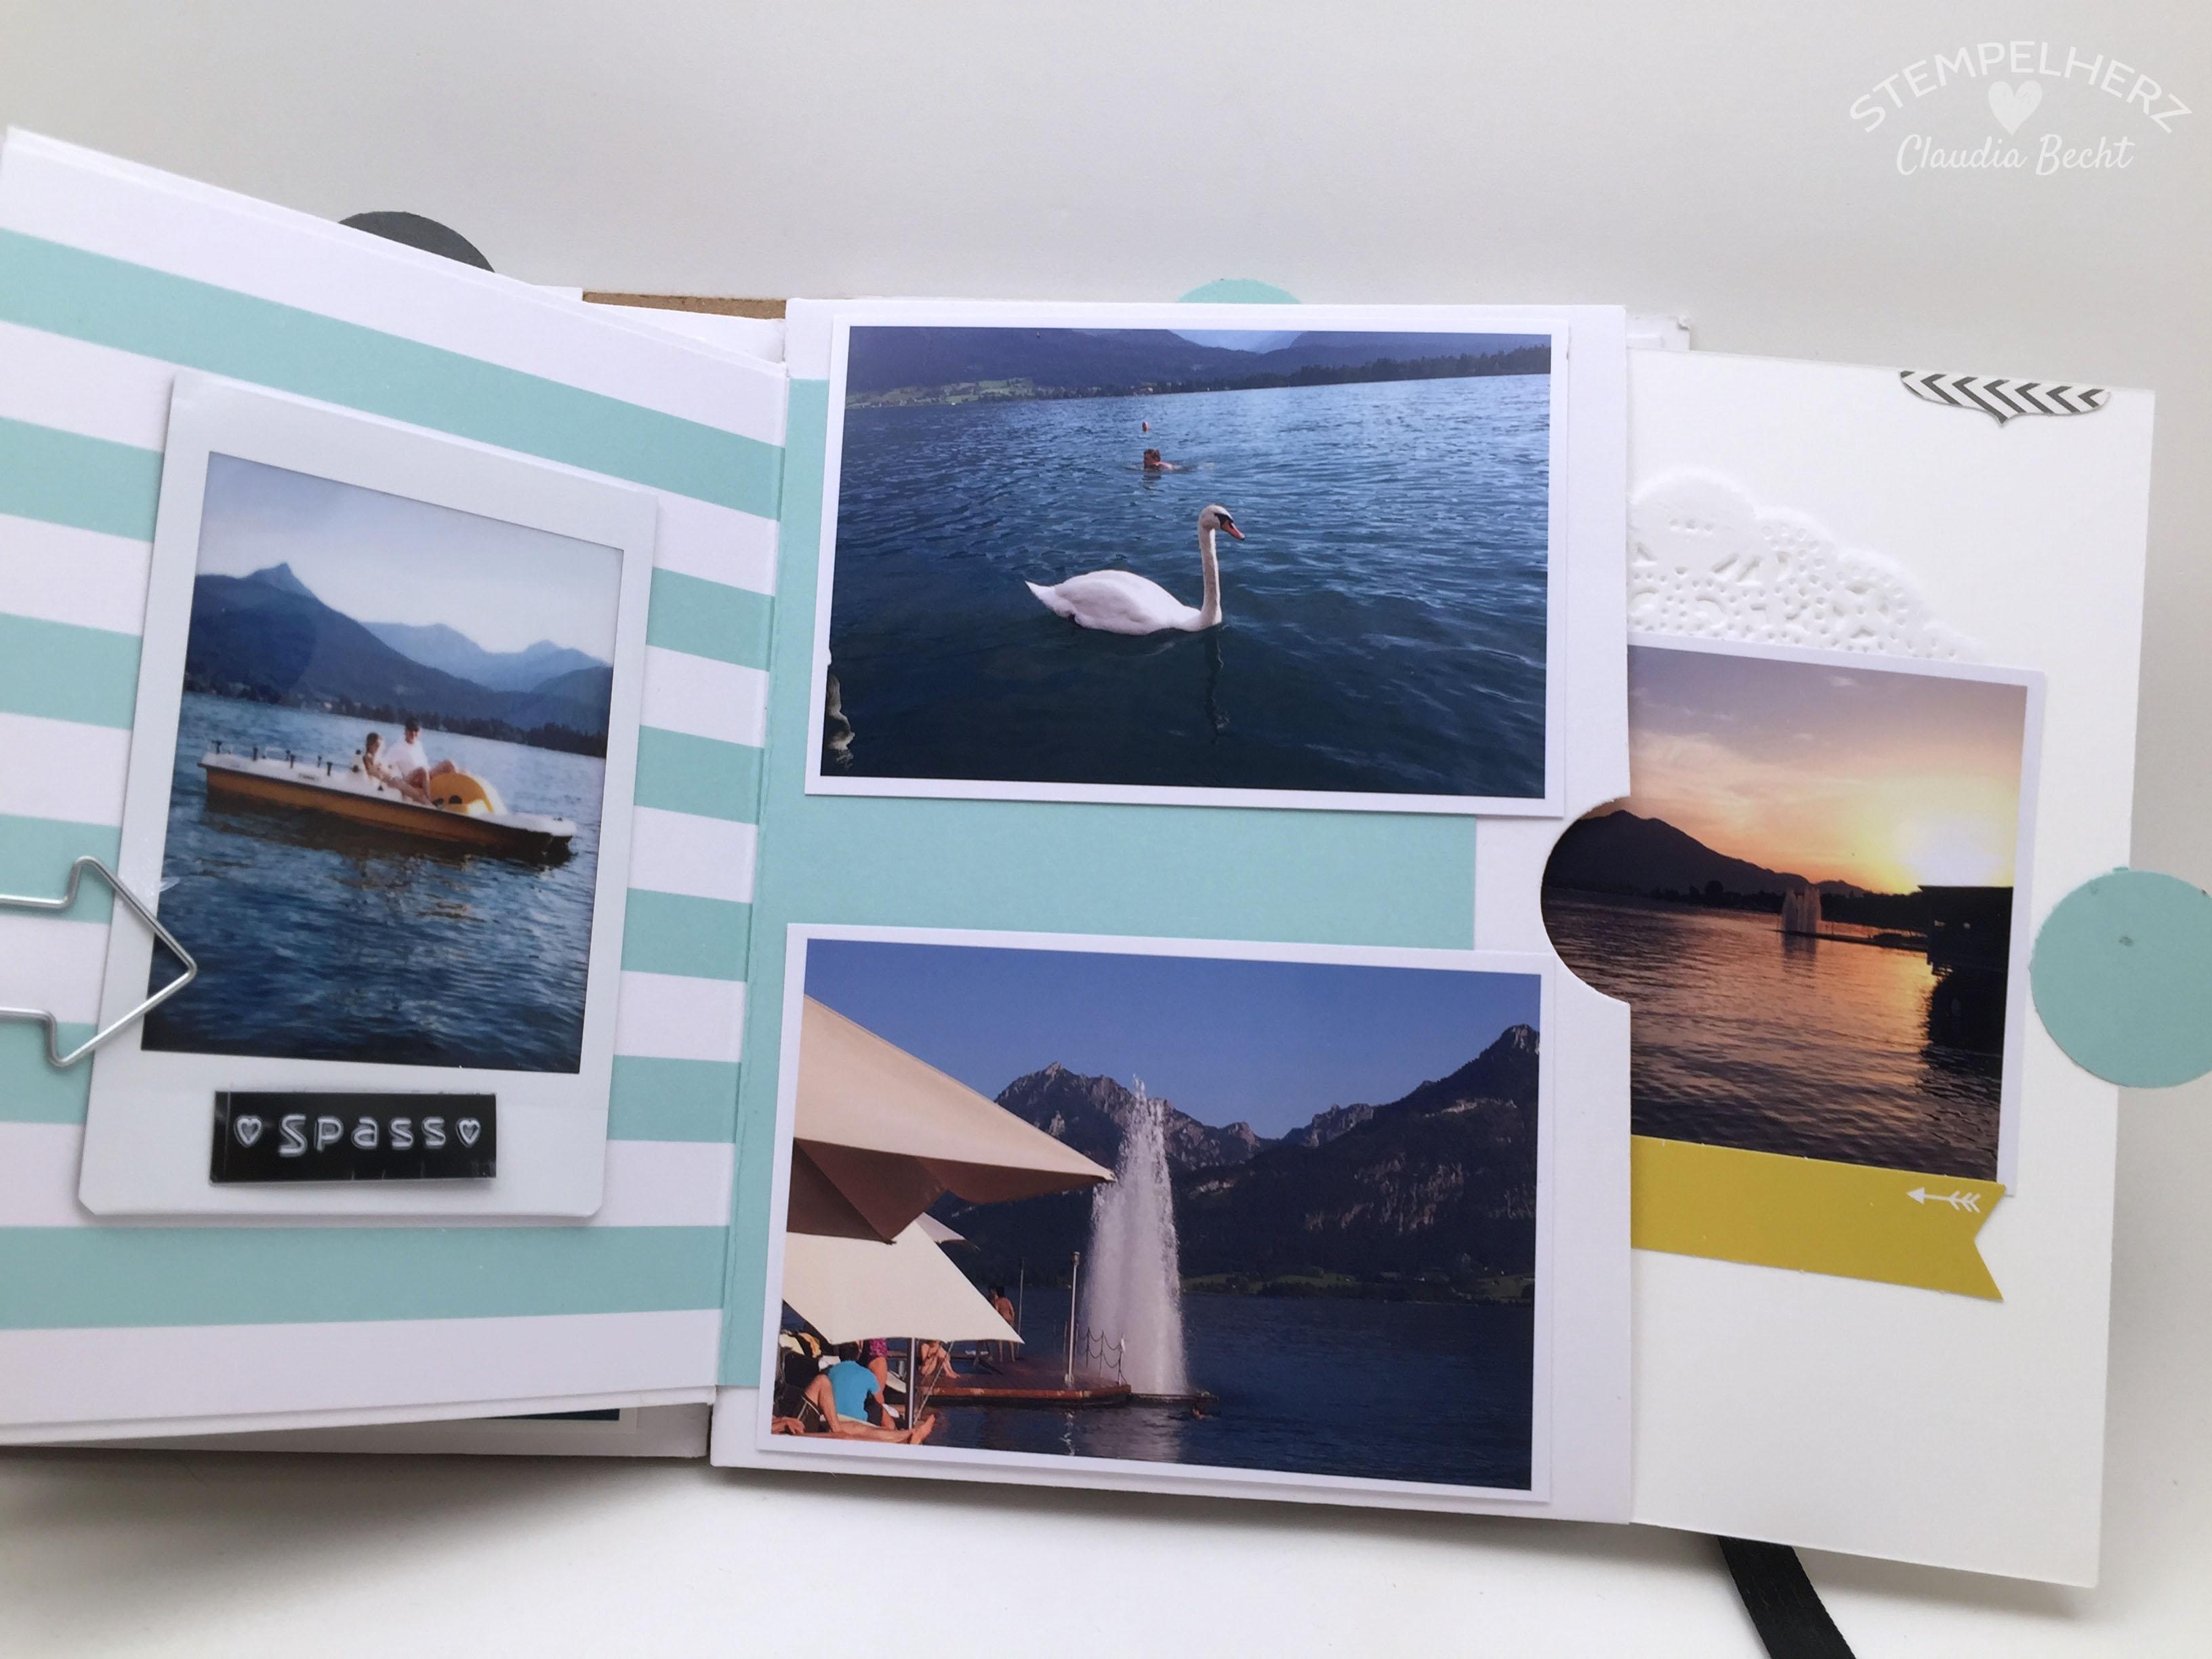 Stampin Up-Stempelherz-Album-Minibook-Minialbum Wolfgangsee 16